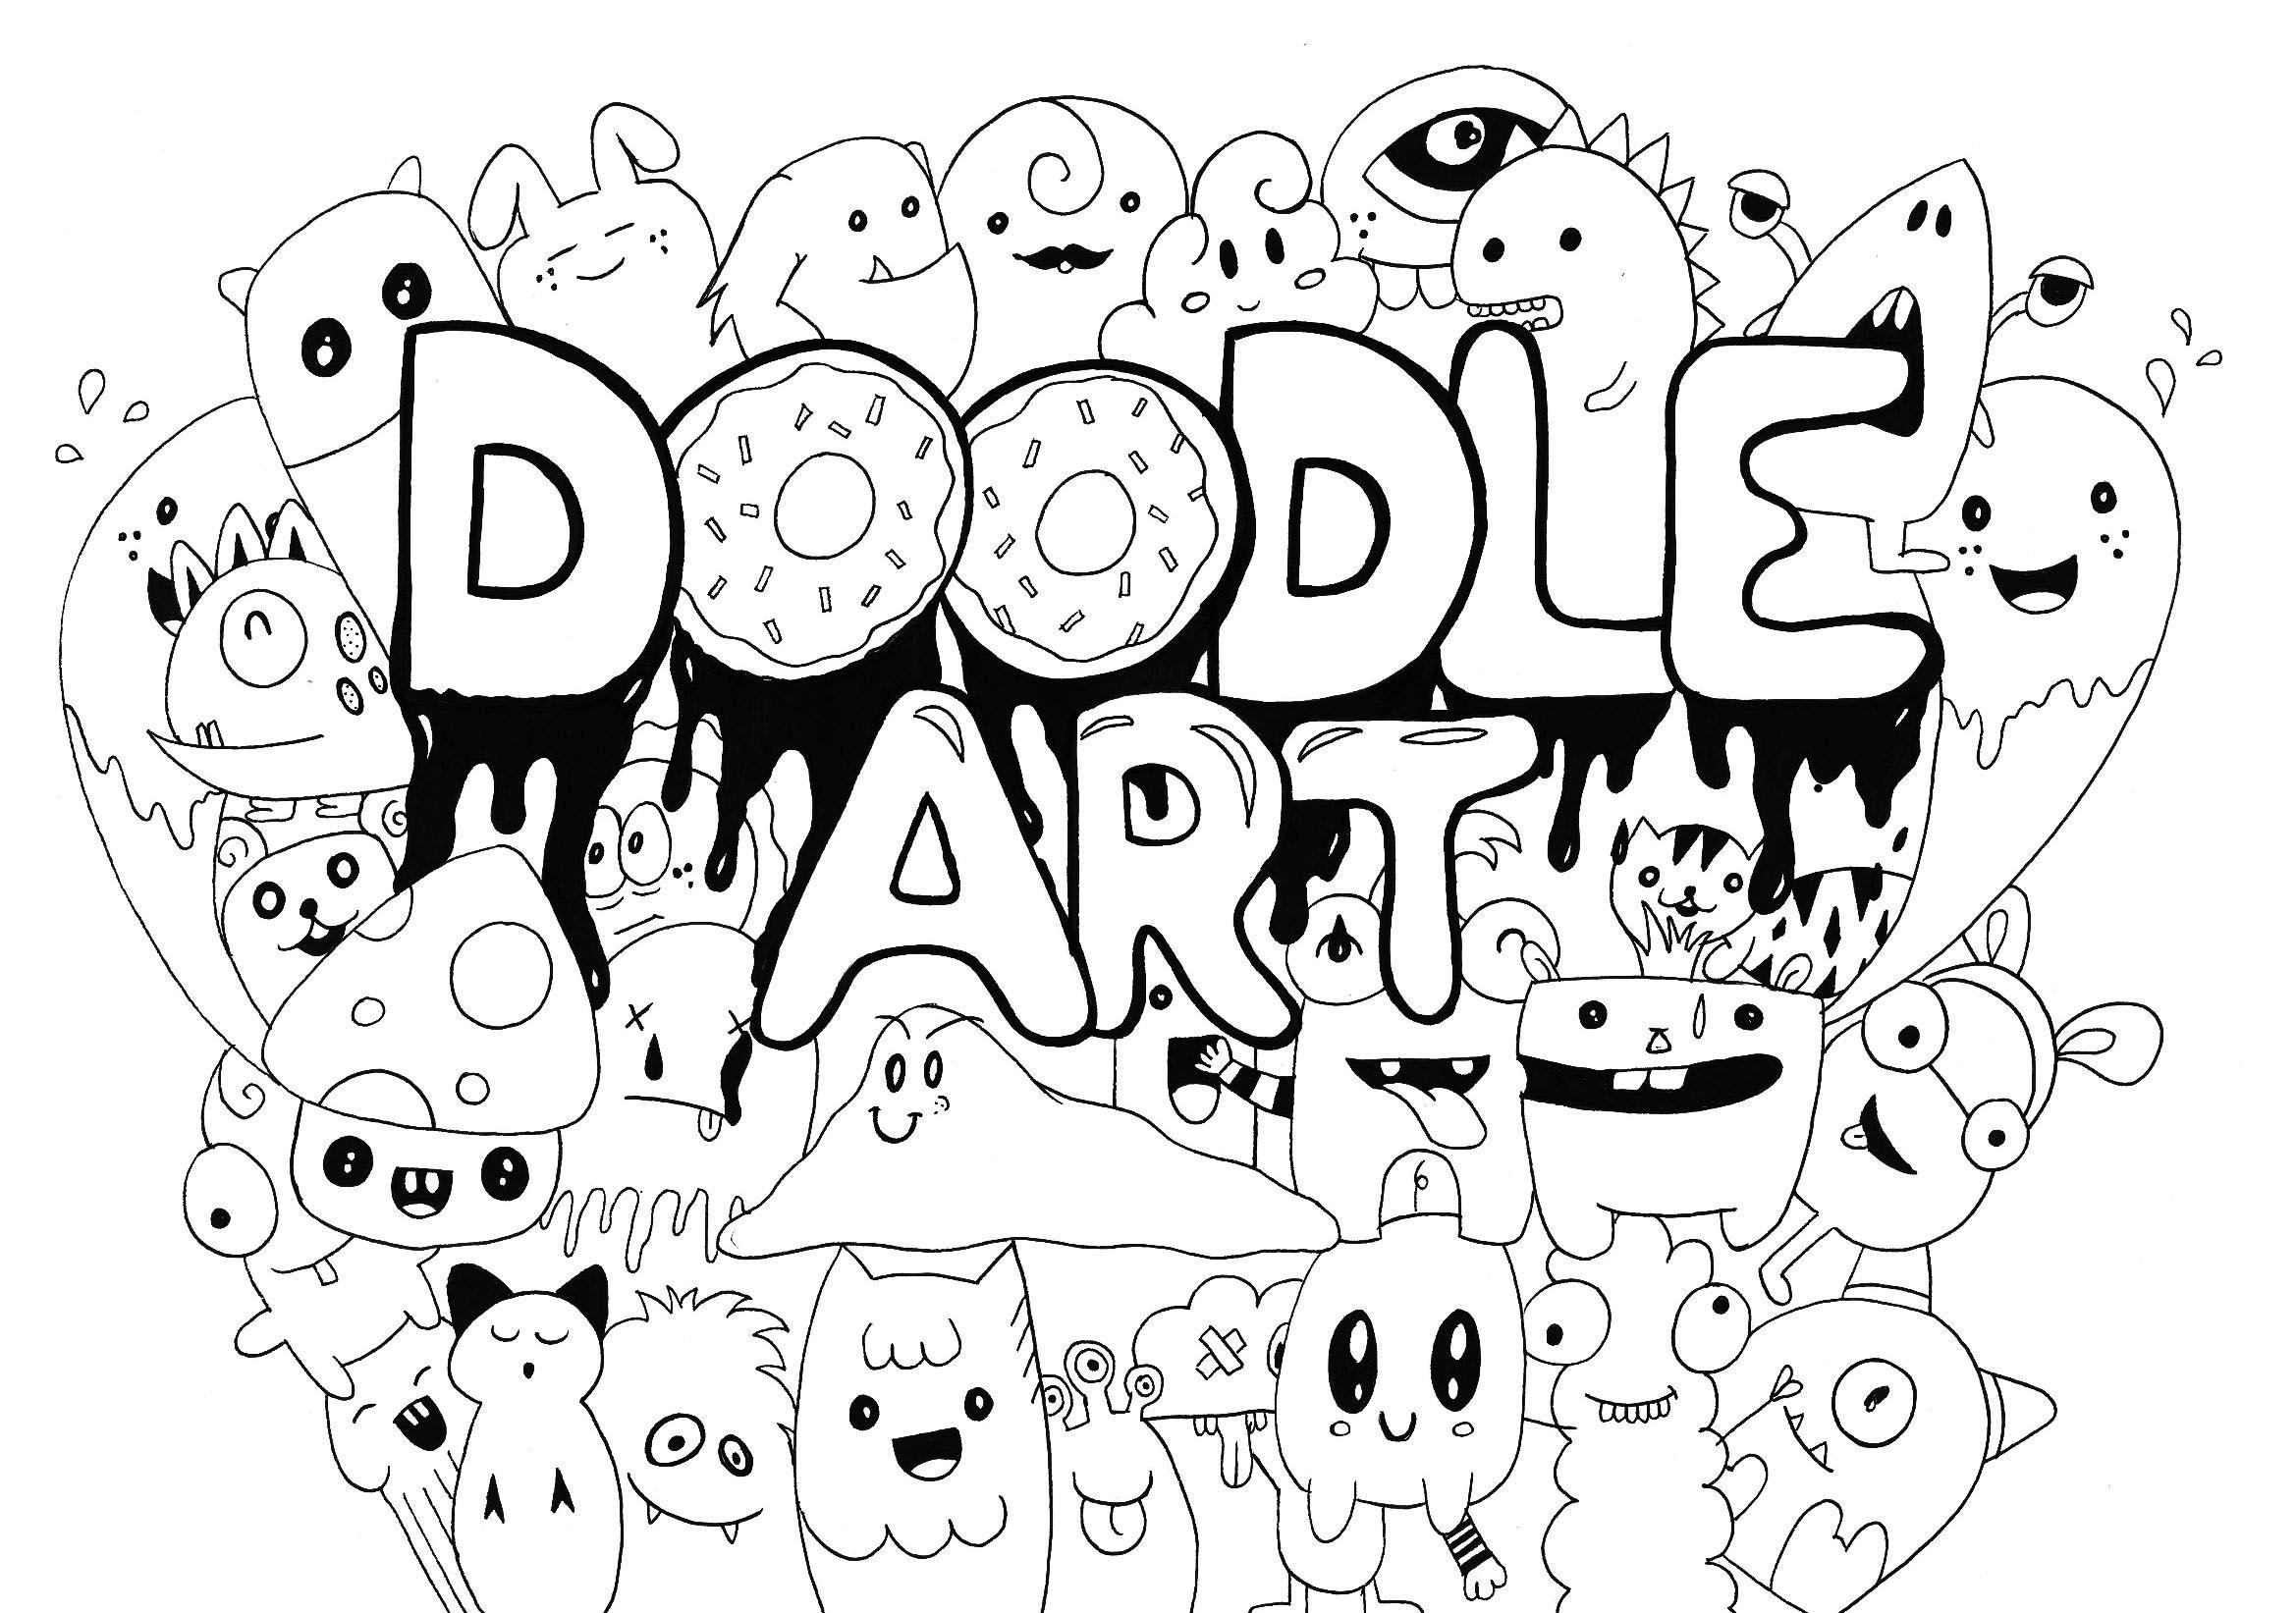 Doodle Art Rachel Doodle Art Doodling Coloring Pages For